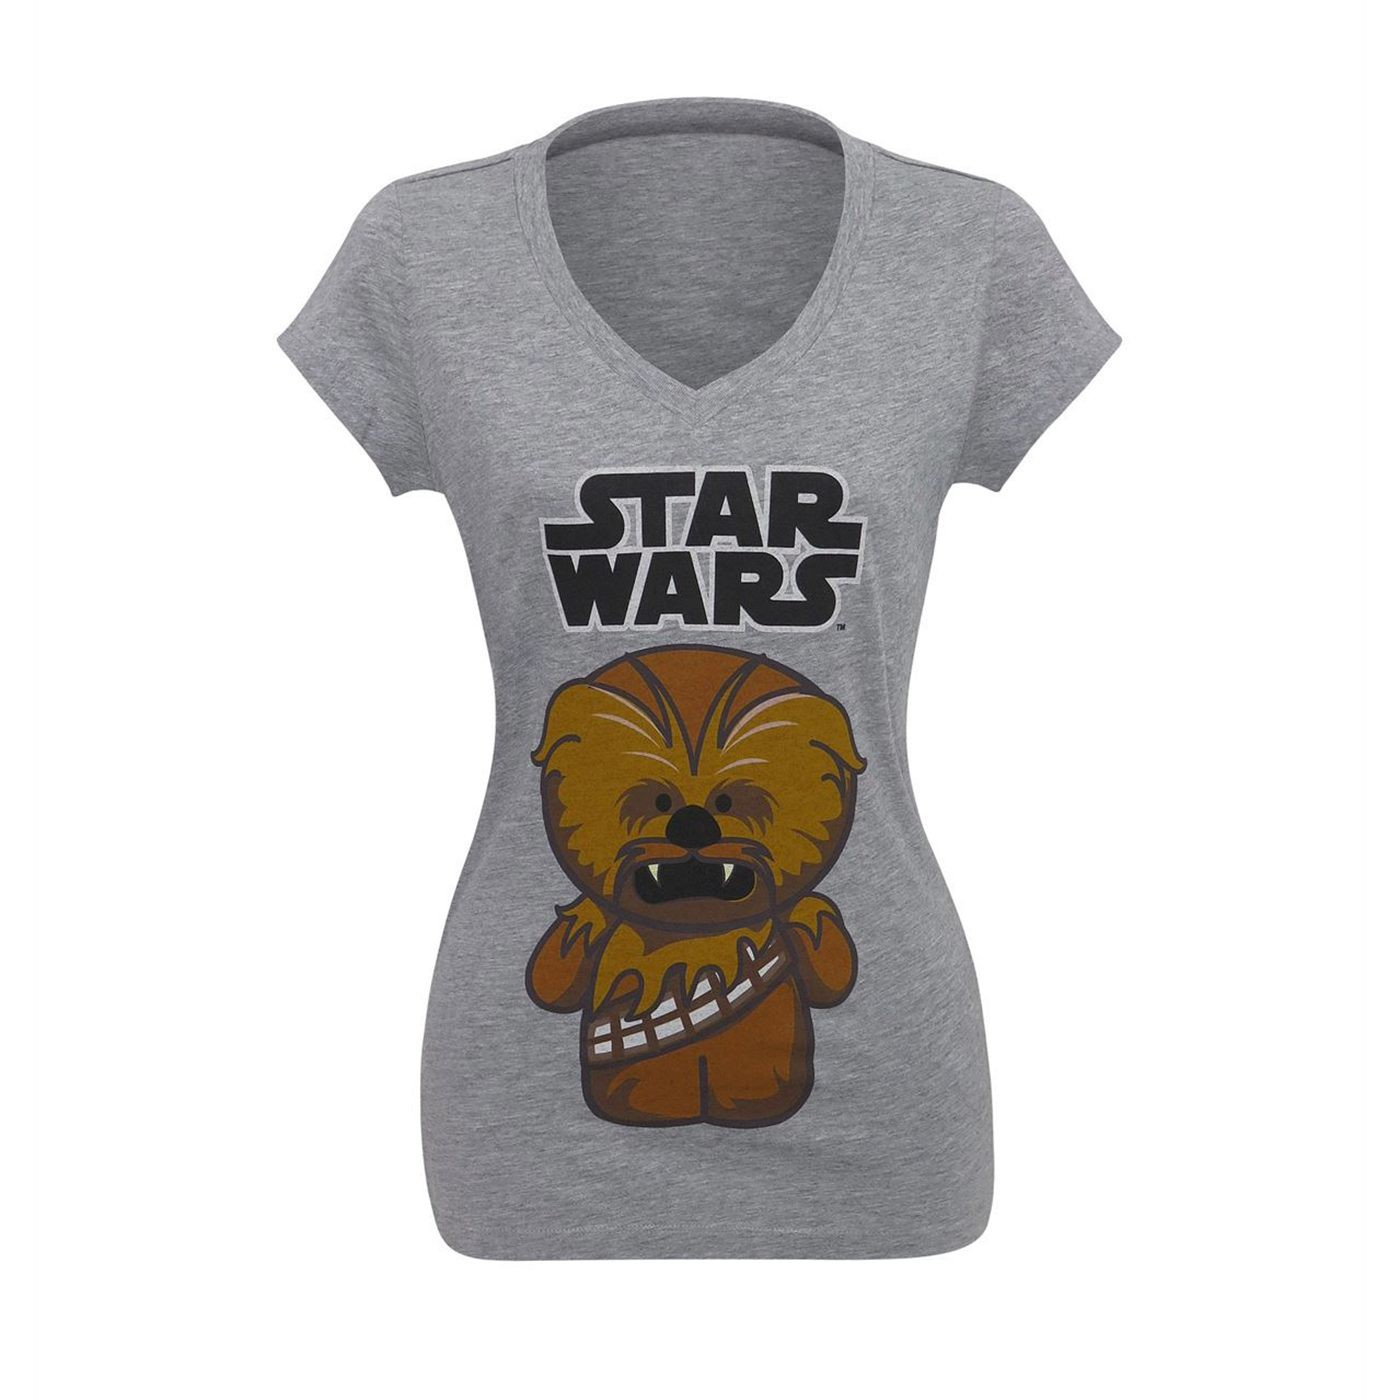 Star Wars Cute Chewbacca Women's V-Neck T-Shirt